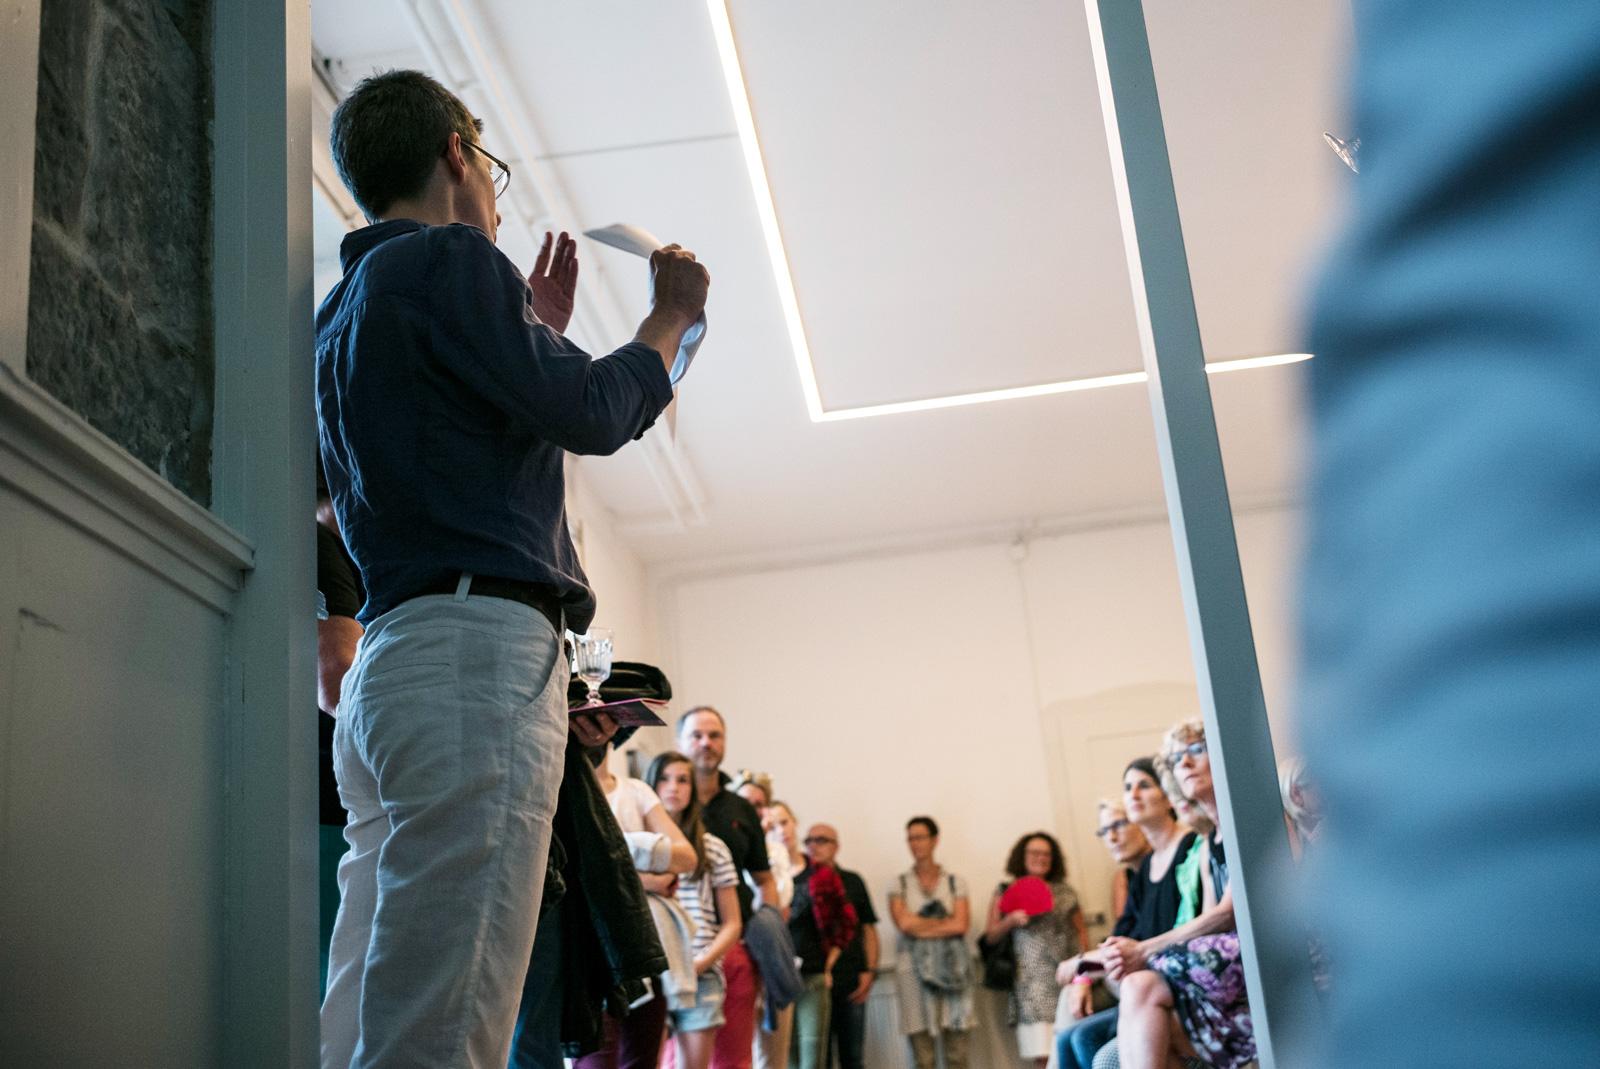 Museum of Emptiness / Eröffnung MoE / Foto: Marcus Gossolt